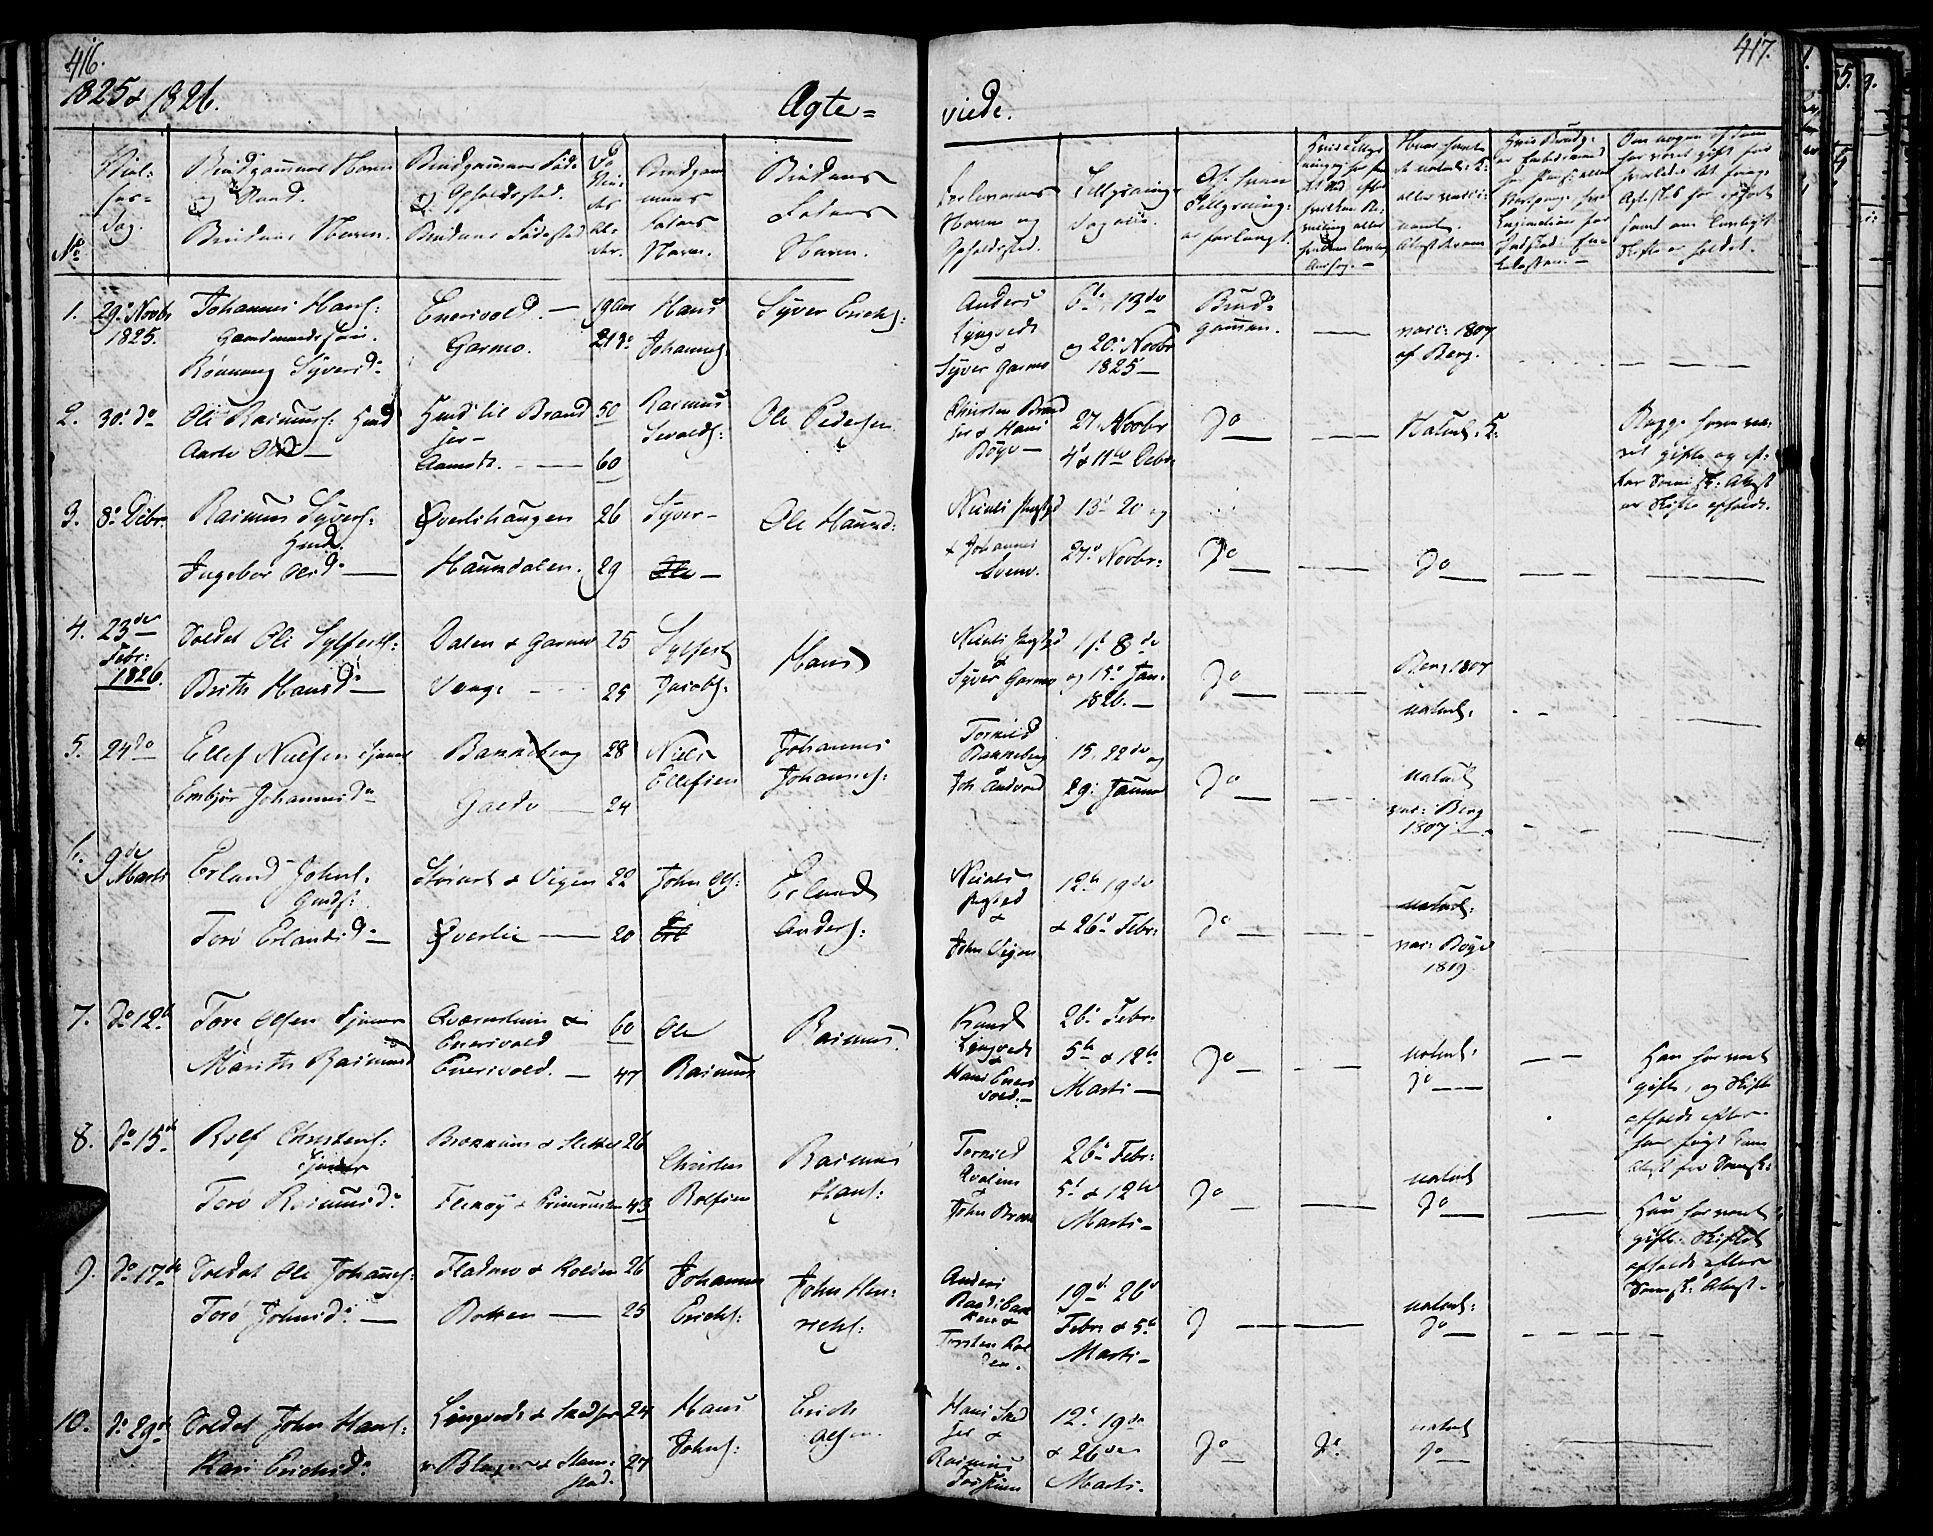 SAH, Lom prestekontor, K/L0005: Parish register (official) no. 5, 1825-1837, p. 416-417